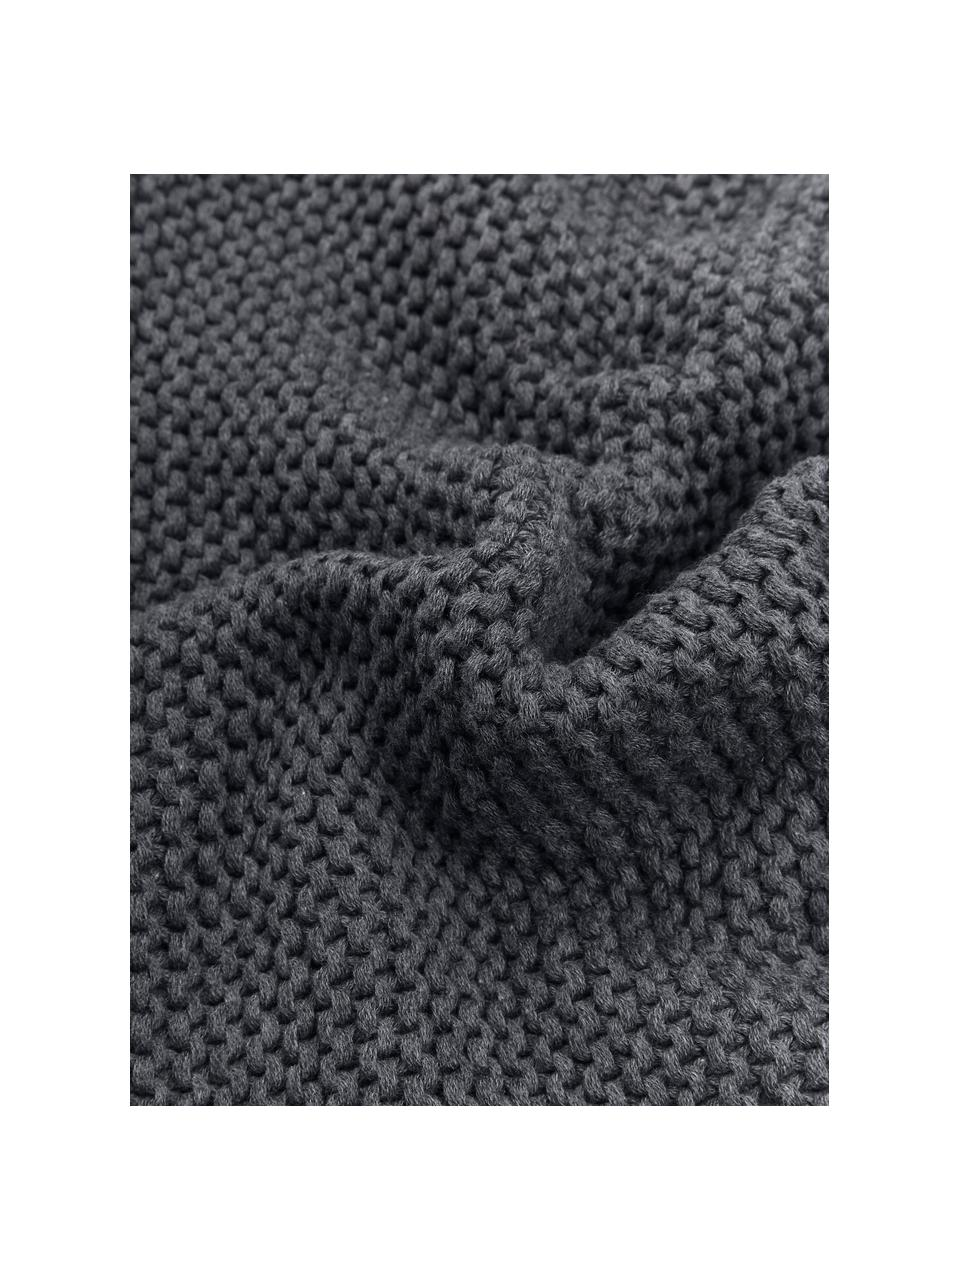 Strickdecke Adalyn aus Bio-Baumwolle in Dunkelgrau, 100% Bio-Baumwolle, GOTS-zertifiziert, Dunkelgrau, 150 x 200 cm